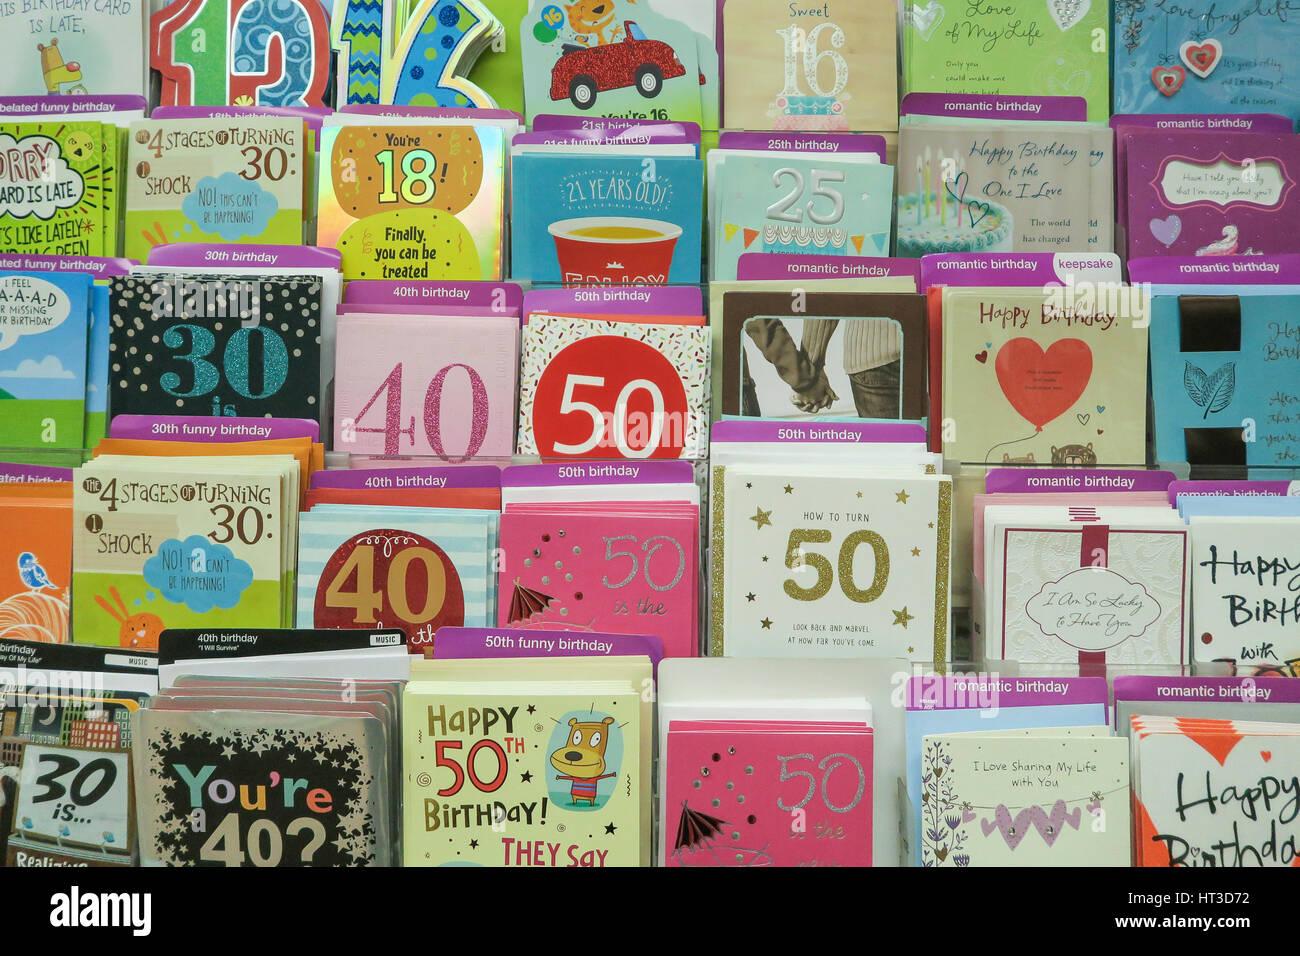 Milestone Birthday Cards At Kmart NYC USA